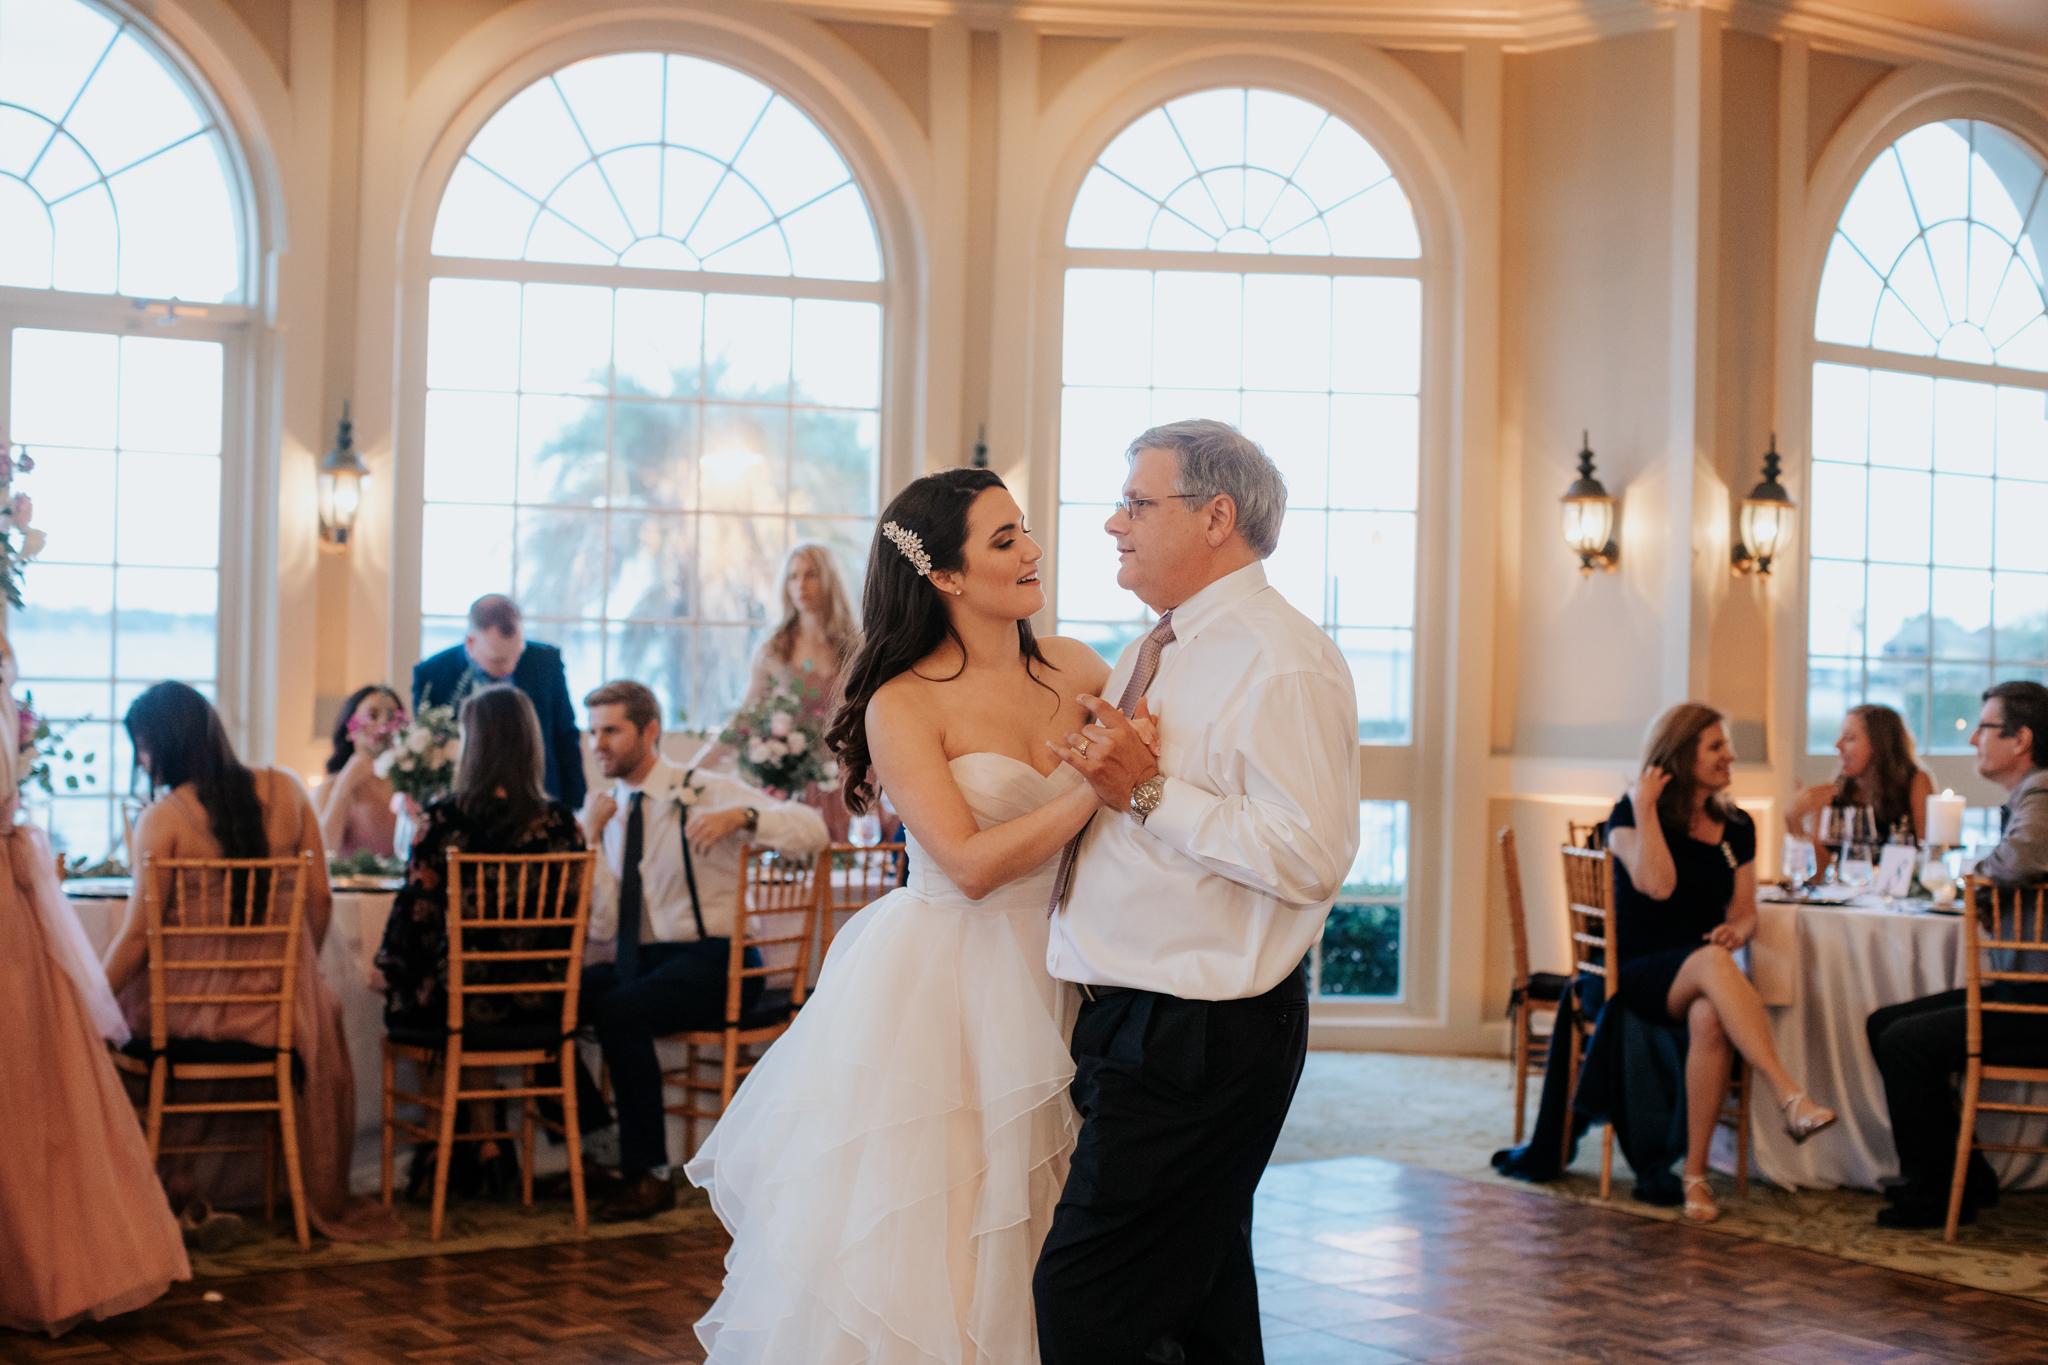 Leah Nicole Photography - Houston Wedding Photographer-Lake Conroe Wedding- Houston Wedding Photographer-44.jpg